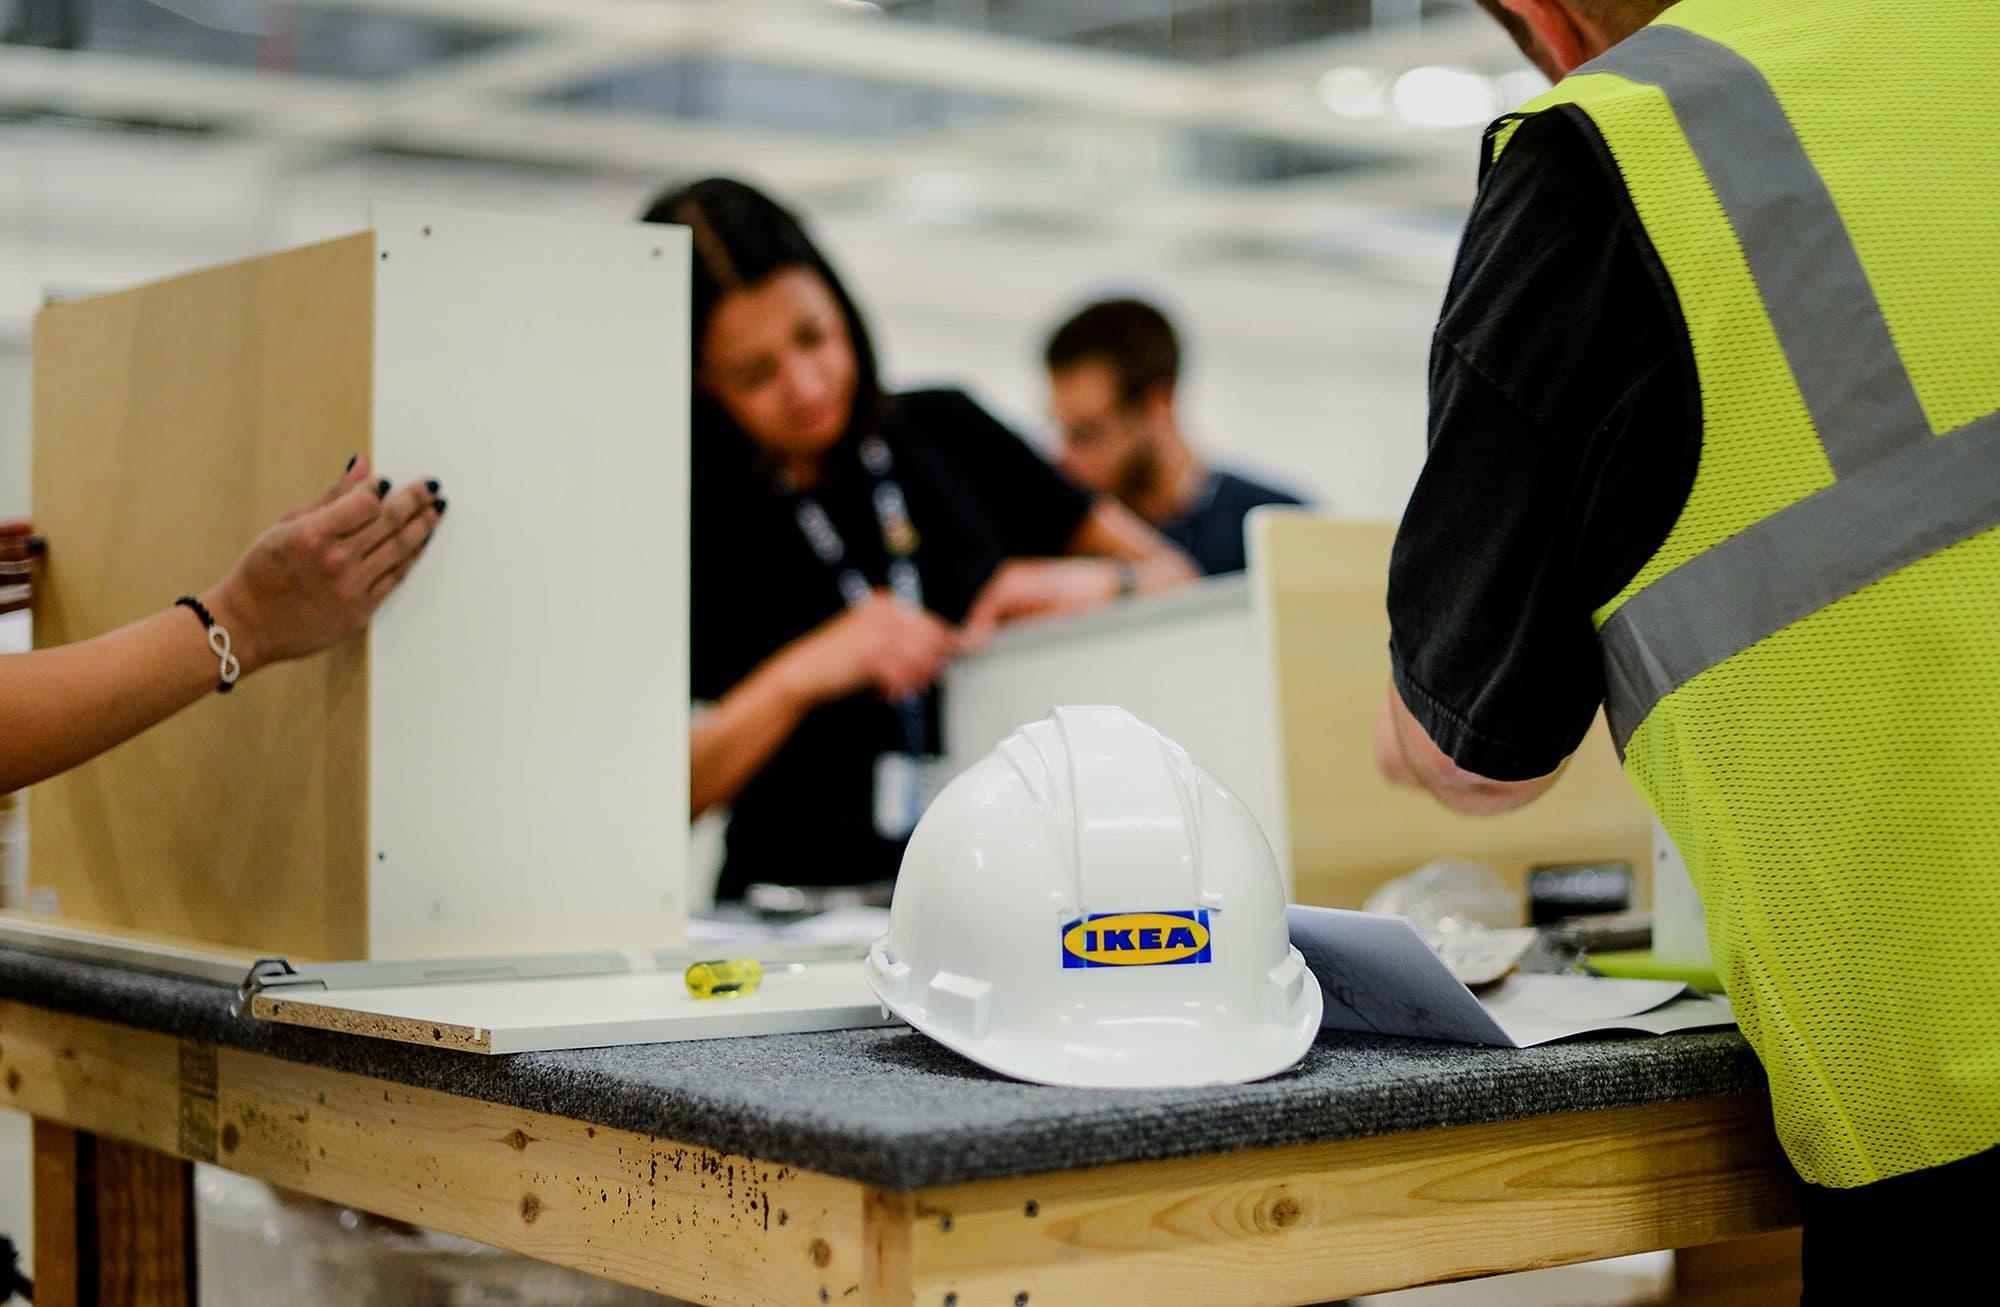 Premium: Ikea Furniture Assembly